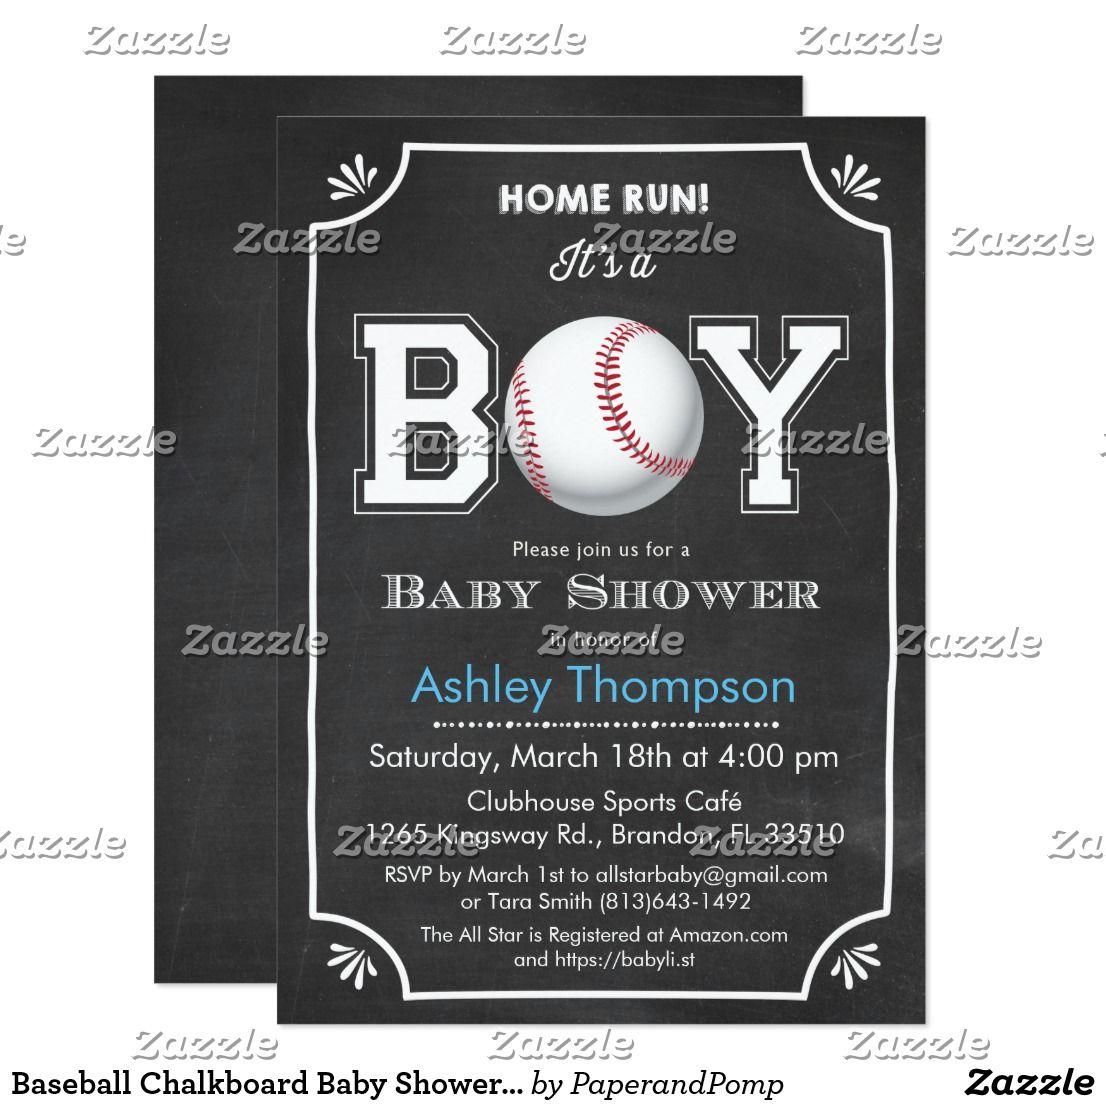 Baseball Chalkboard Baby Shower Invitation | Chalkboard baby and ...